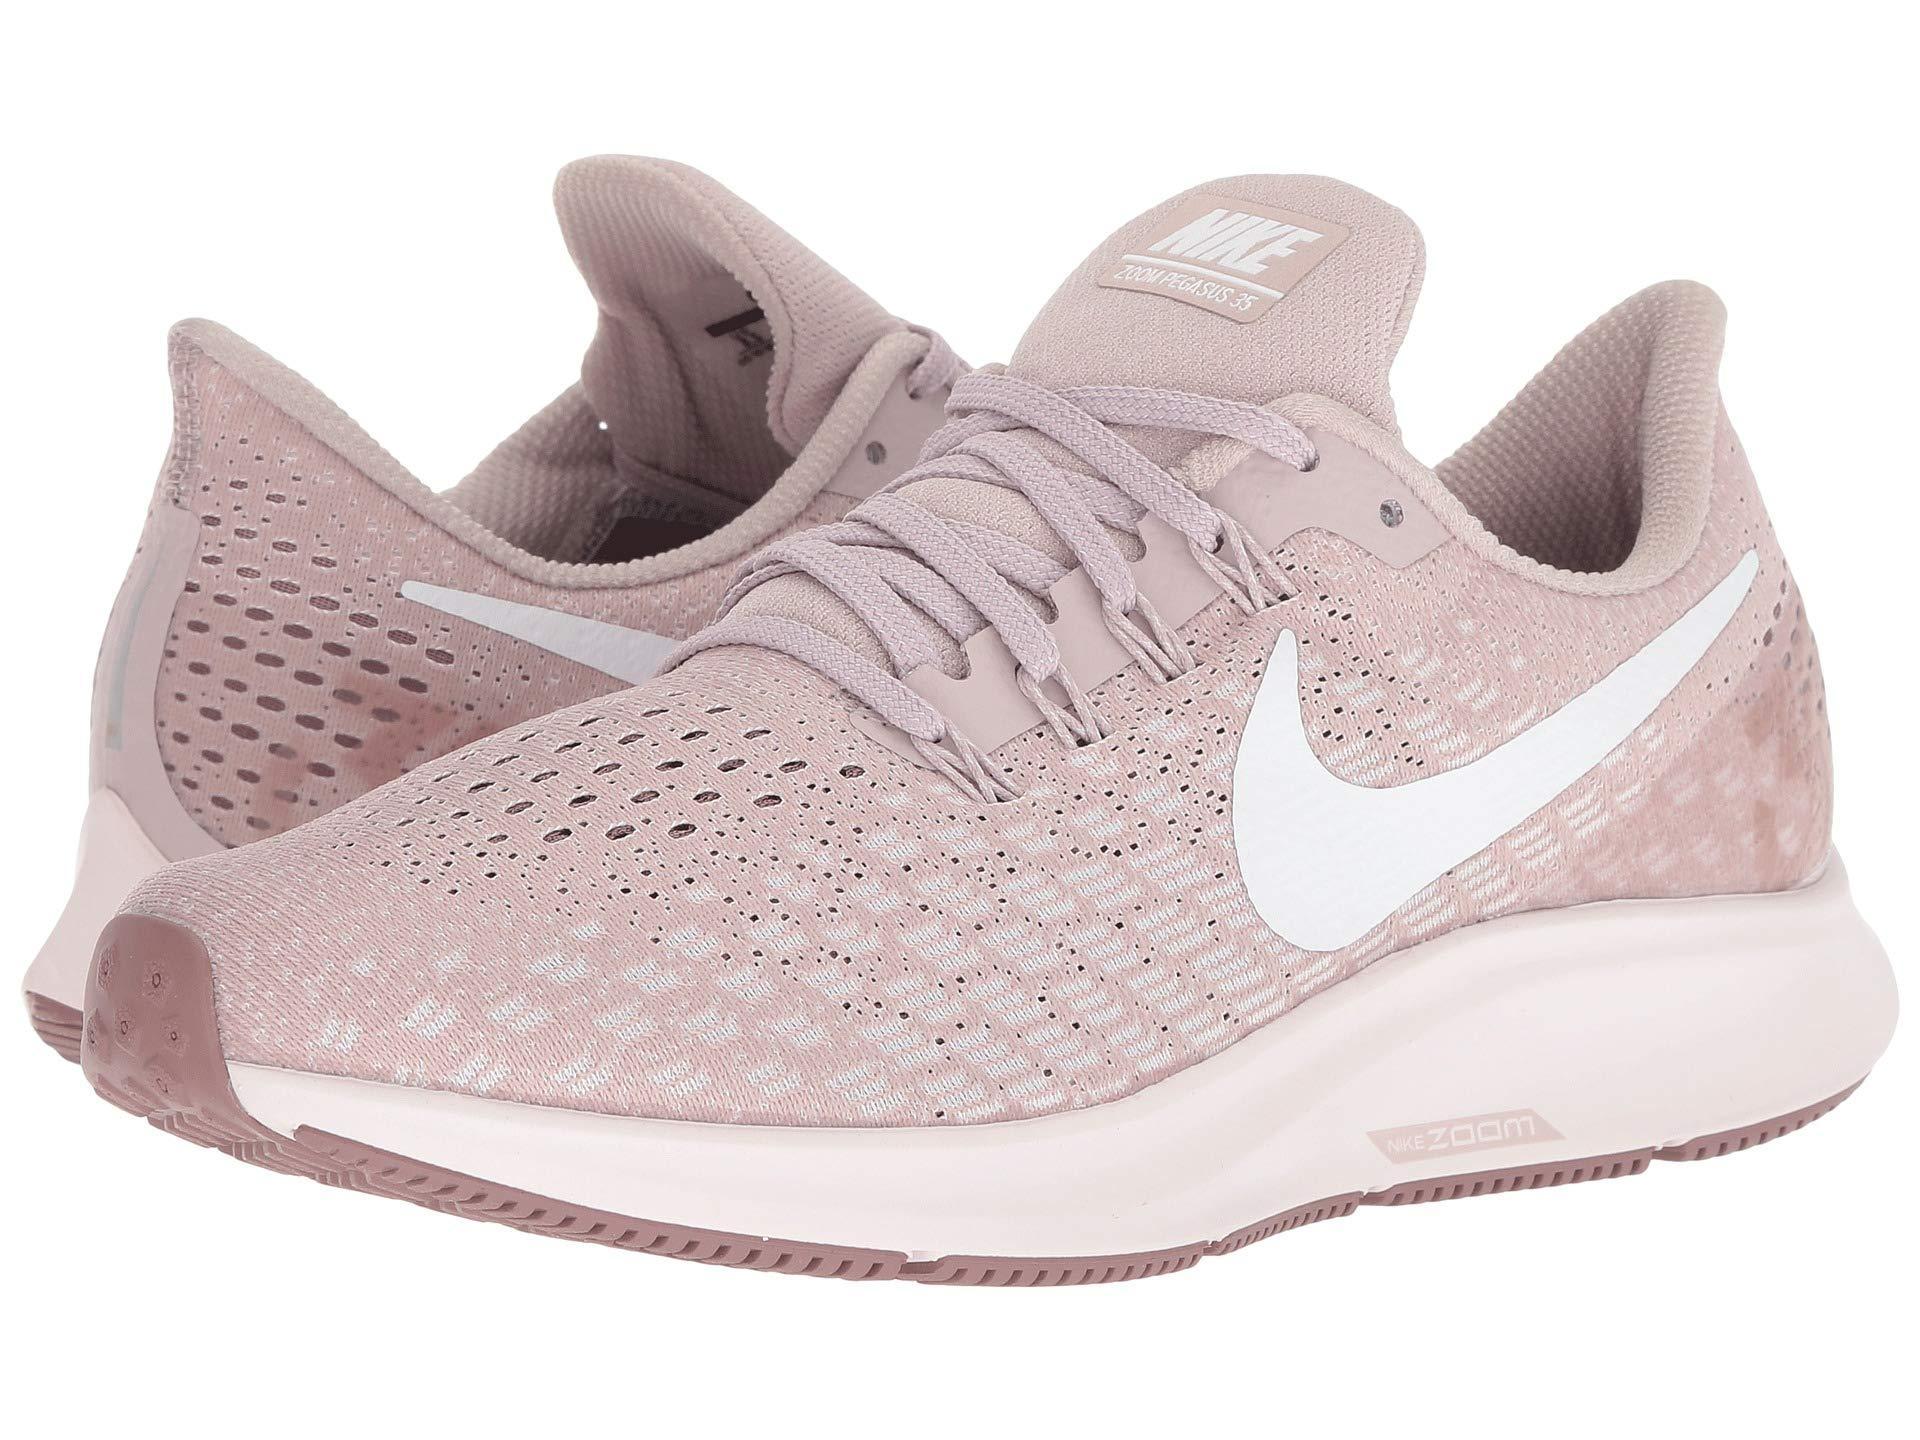 Lyst - Nike Air Zoom Pegasus 35 (vast Grey black pink Foam lime ... 142cc25dd